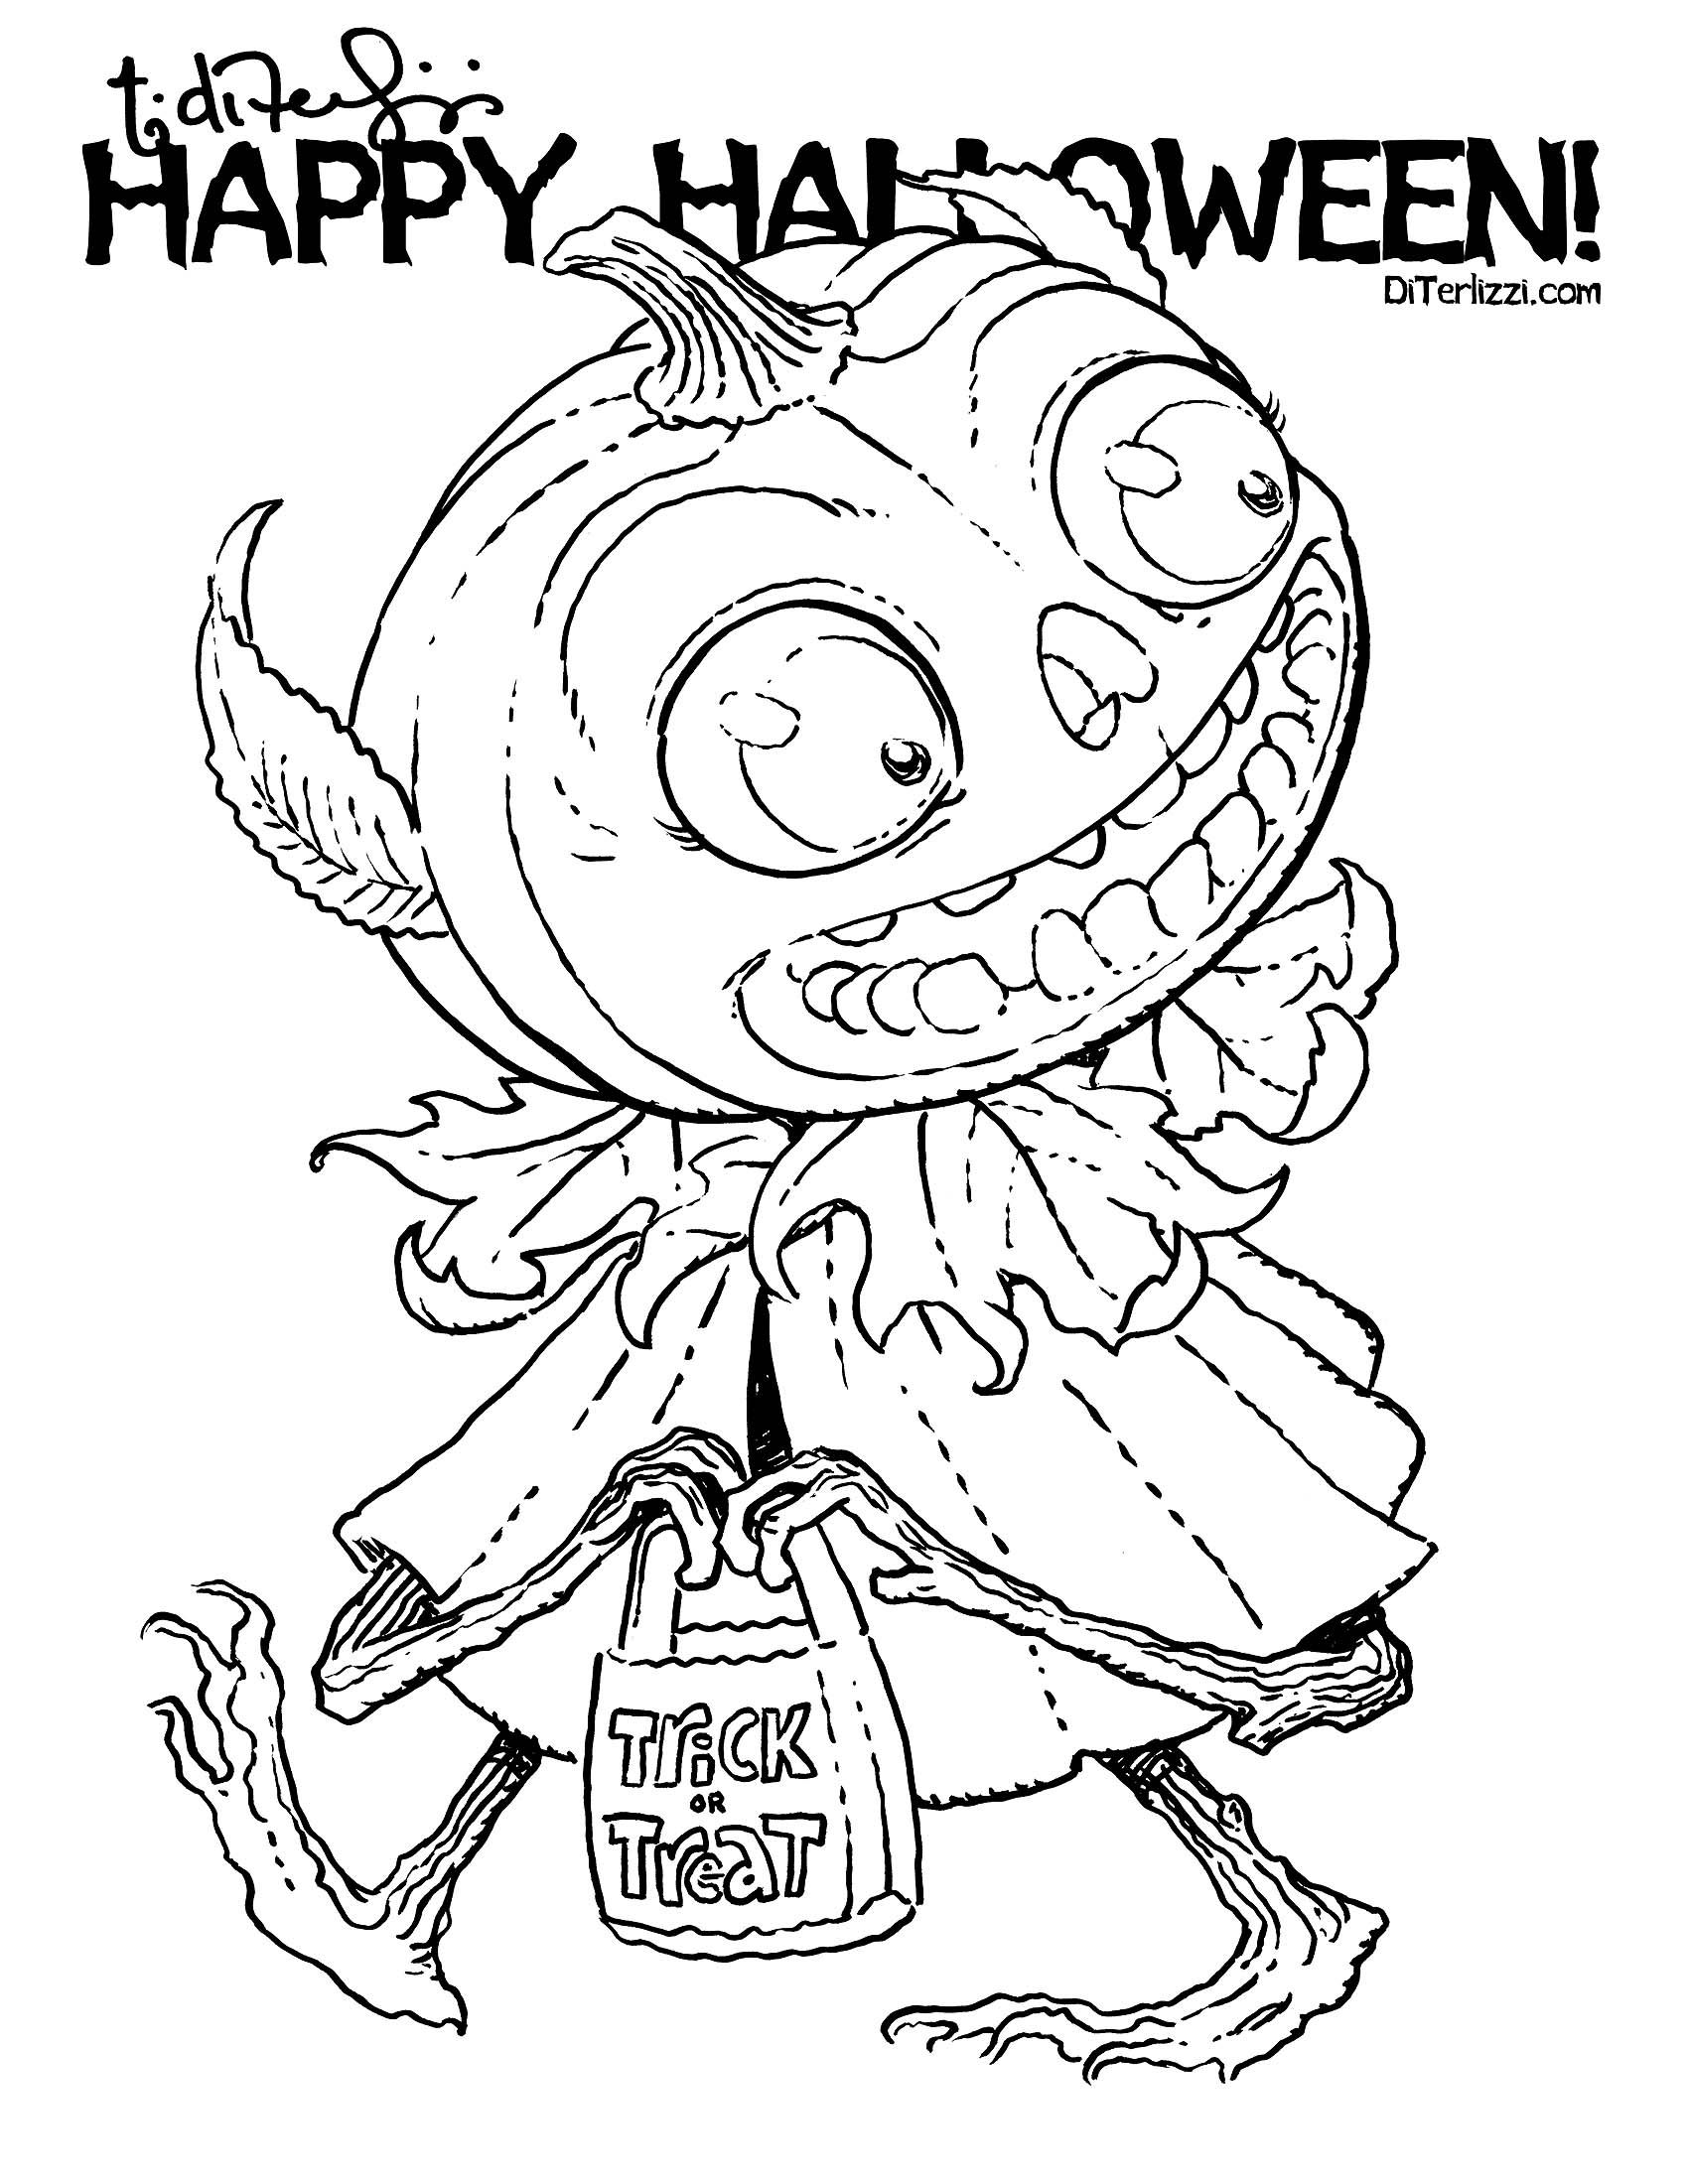 Trick-or-Treat Jack | Coloring book art, Halloween ...